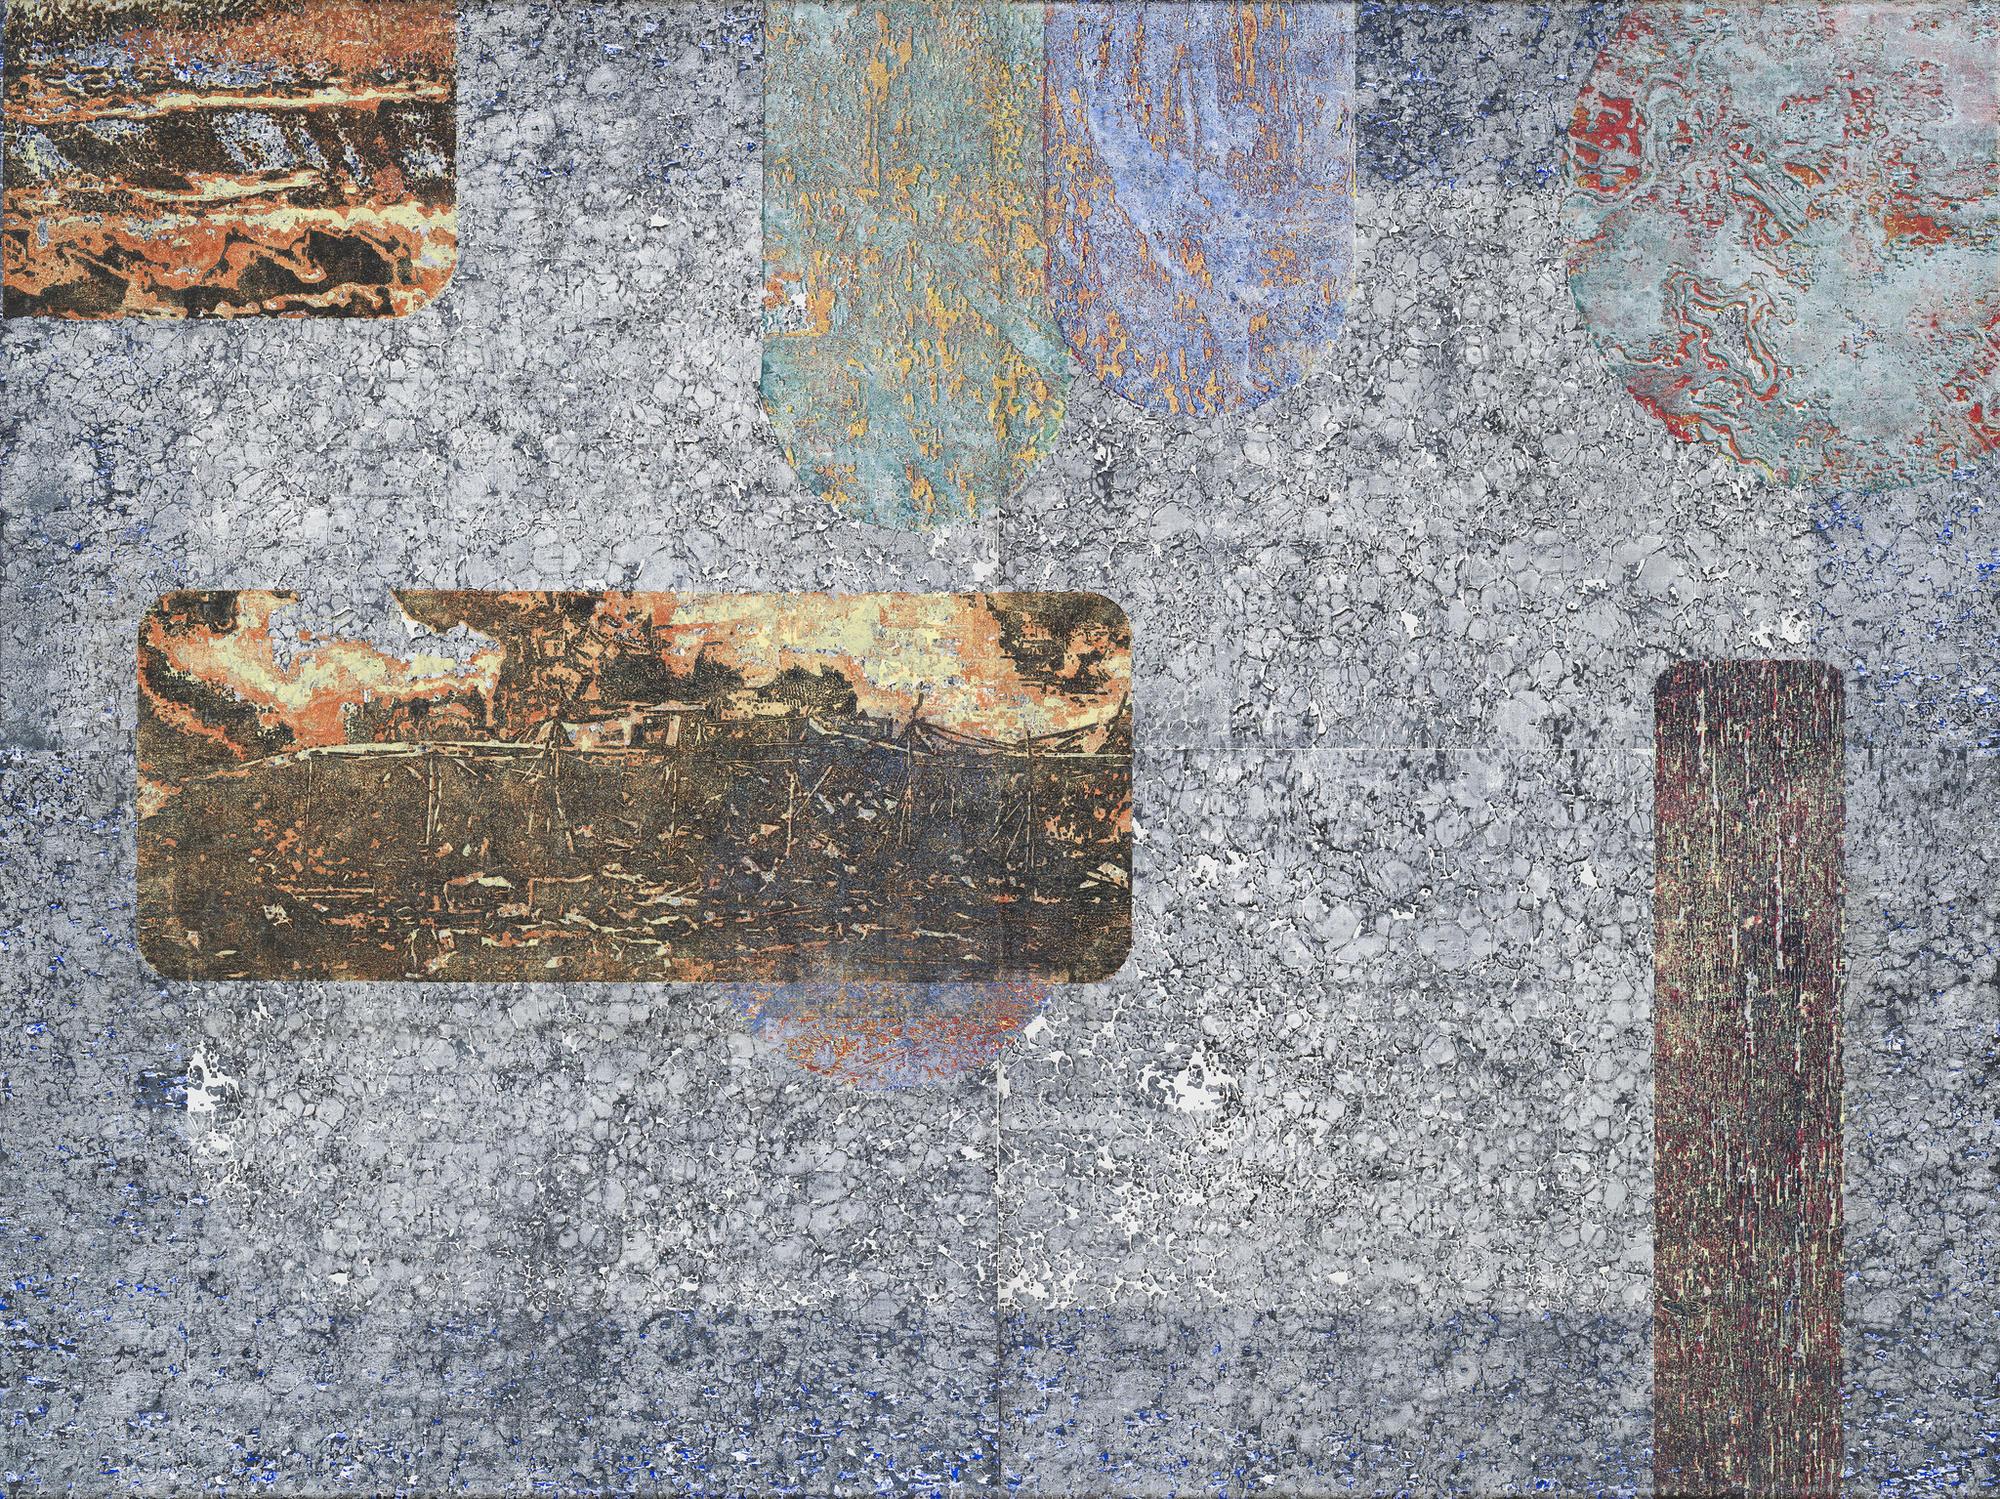 """Epilogue II,"" woodblock print by Martin Werthmann."